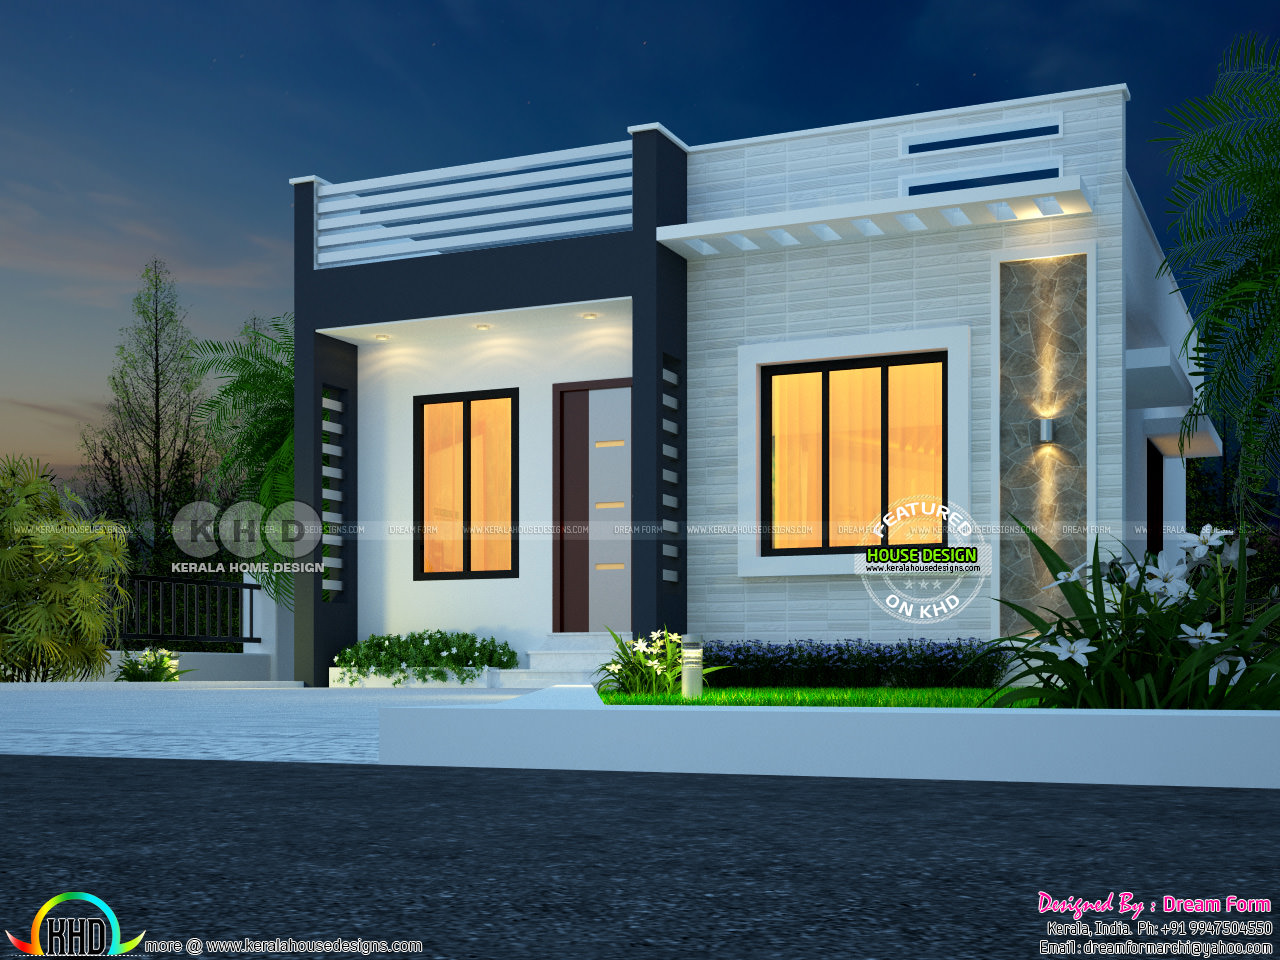 Under 10 Lakhs Kerala Home Kerala Home Design Bloglovin